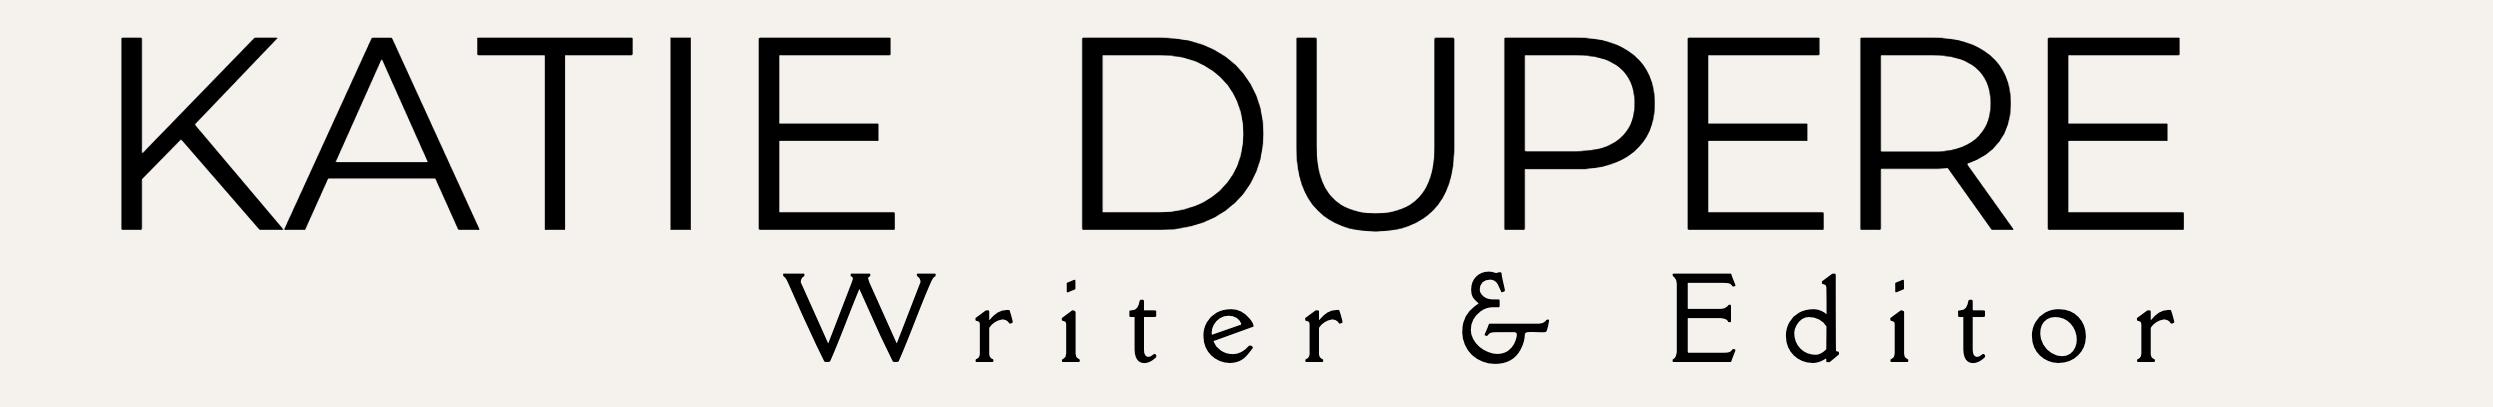 Katie Dupere, Writer & Editor